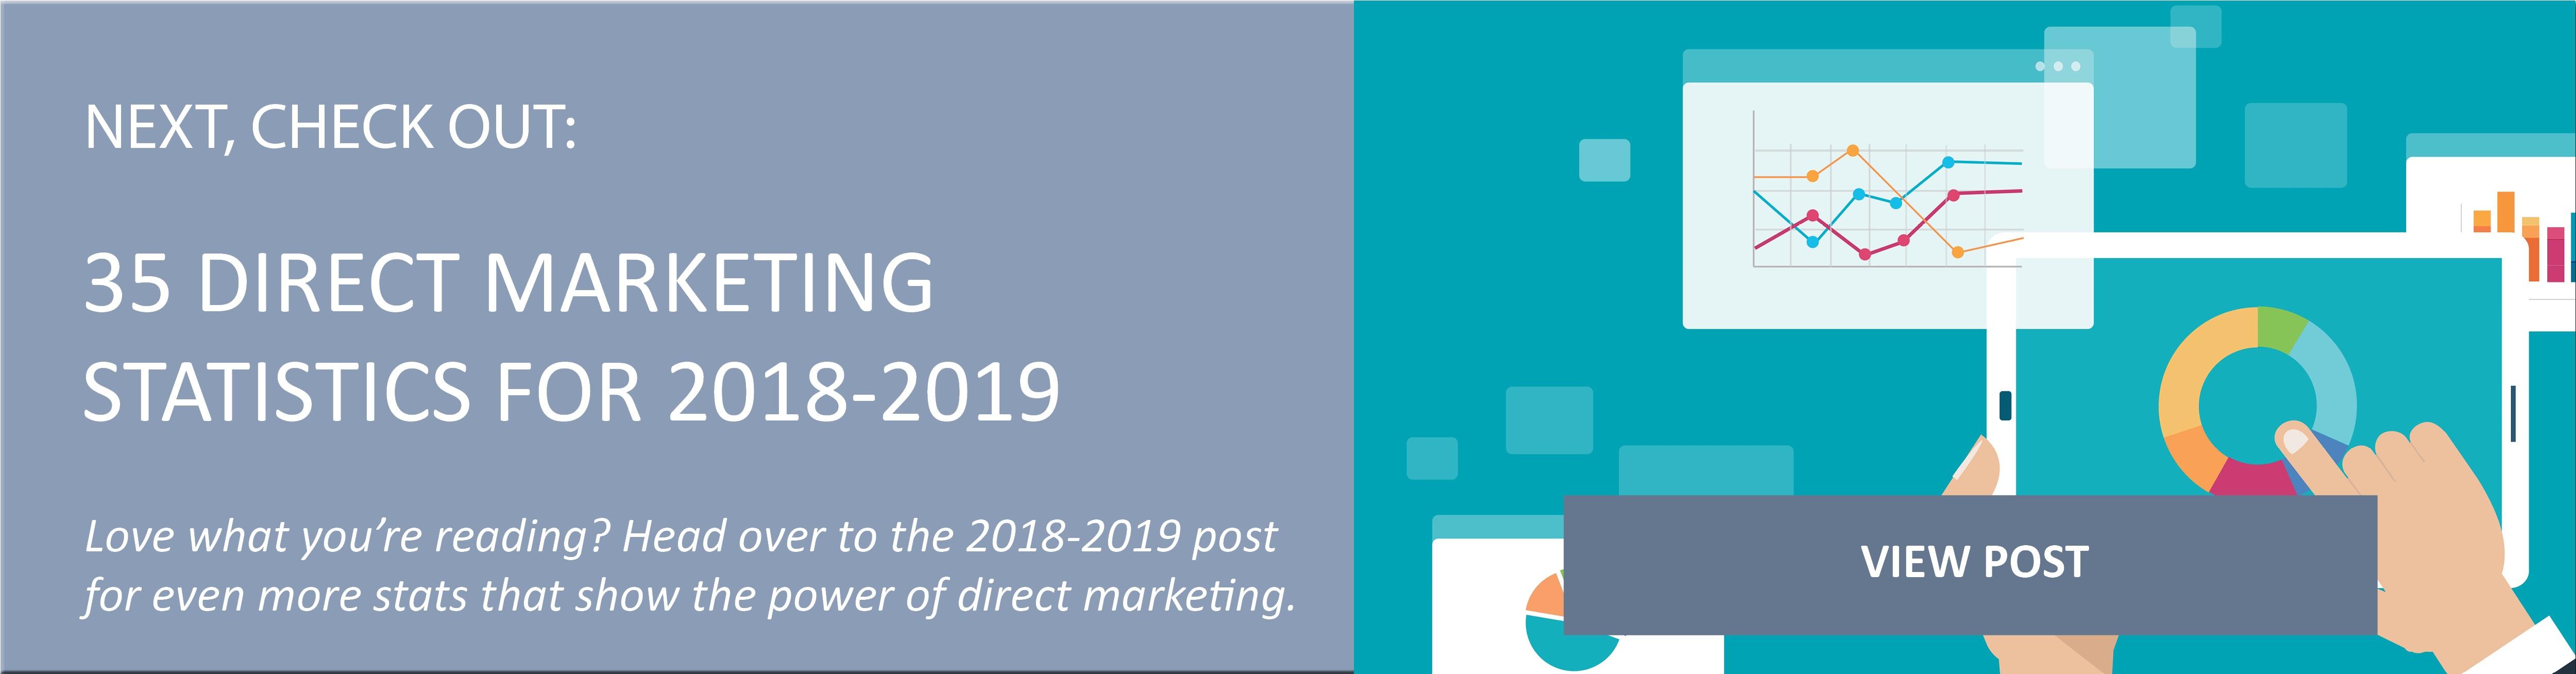 CTA-compu-mail-2018-2019-stats-post